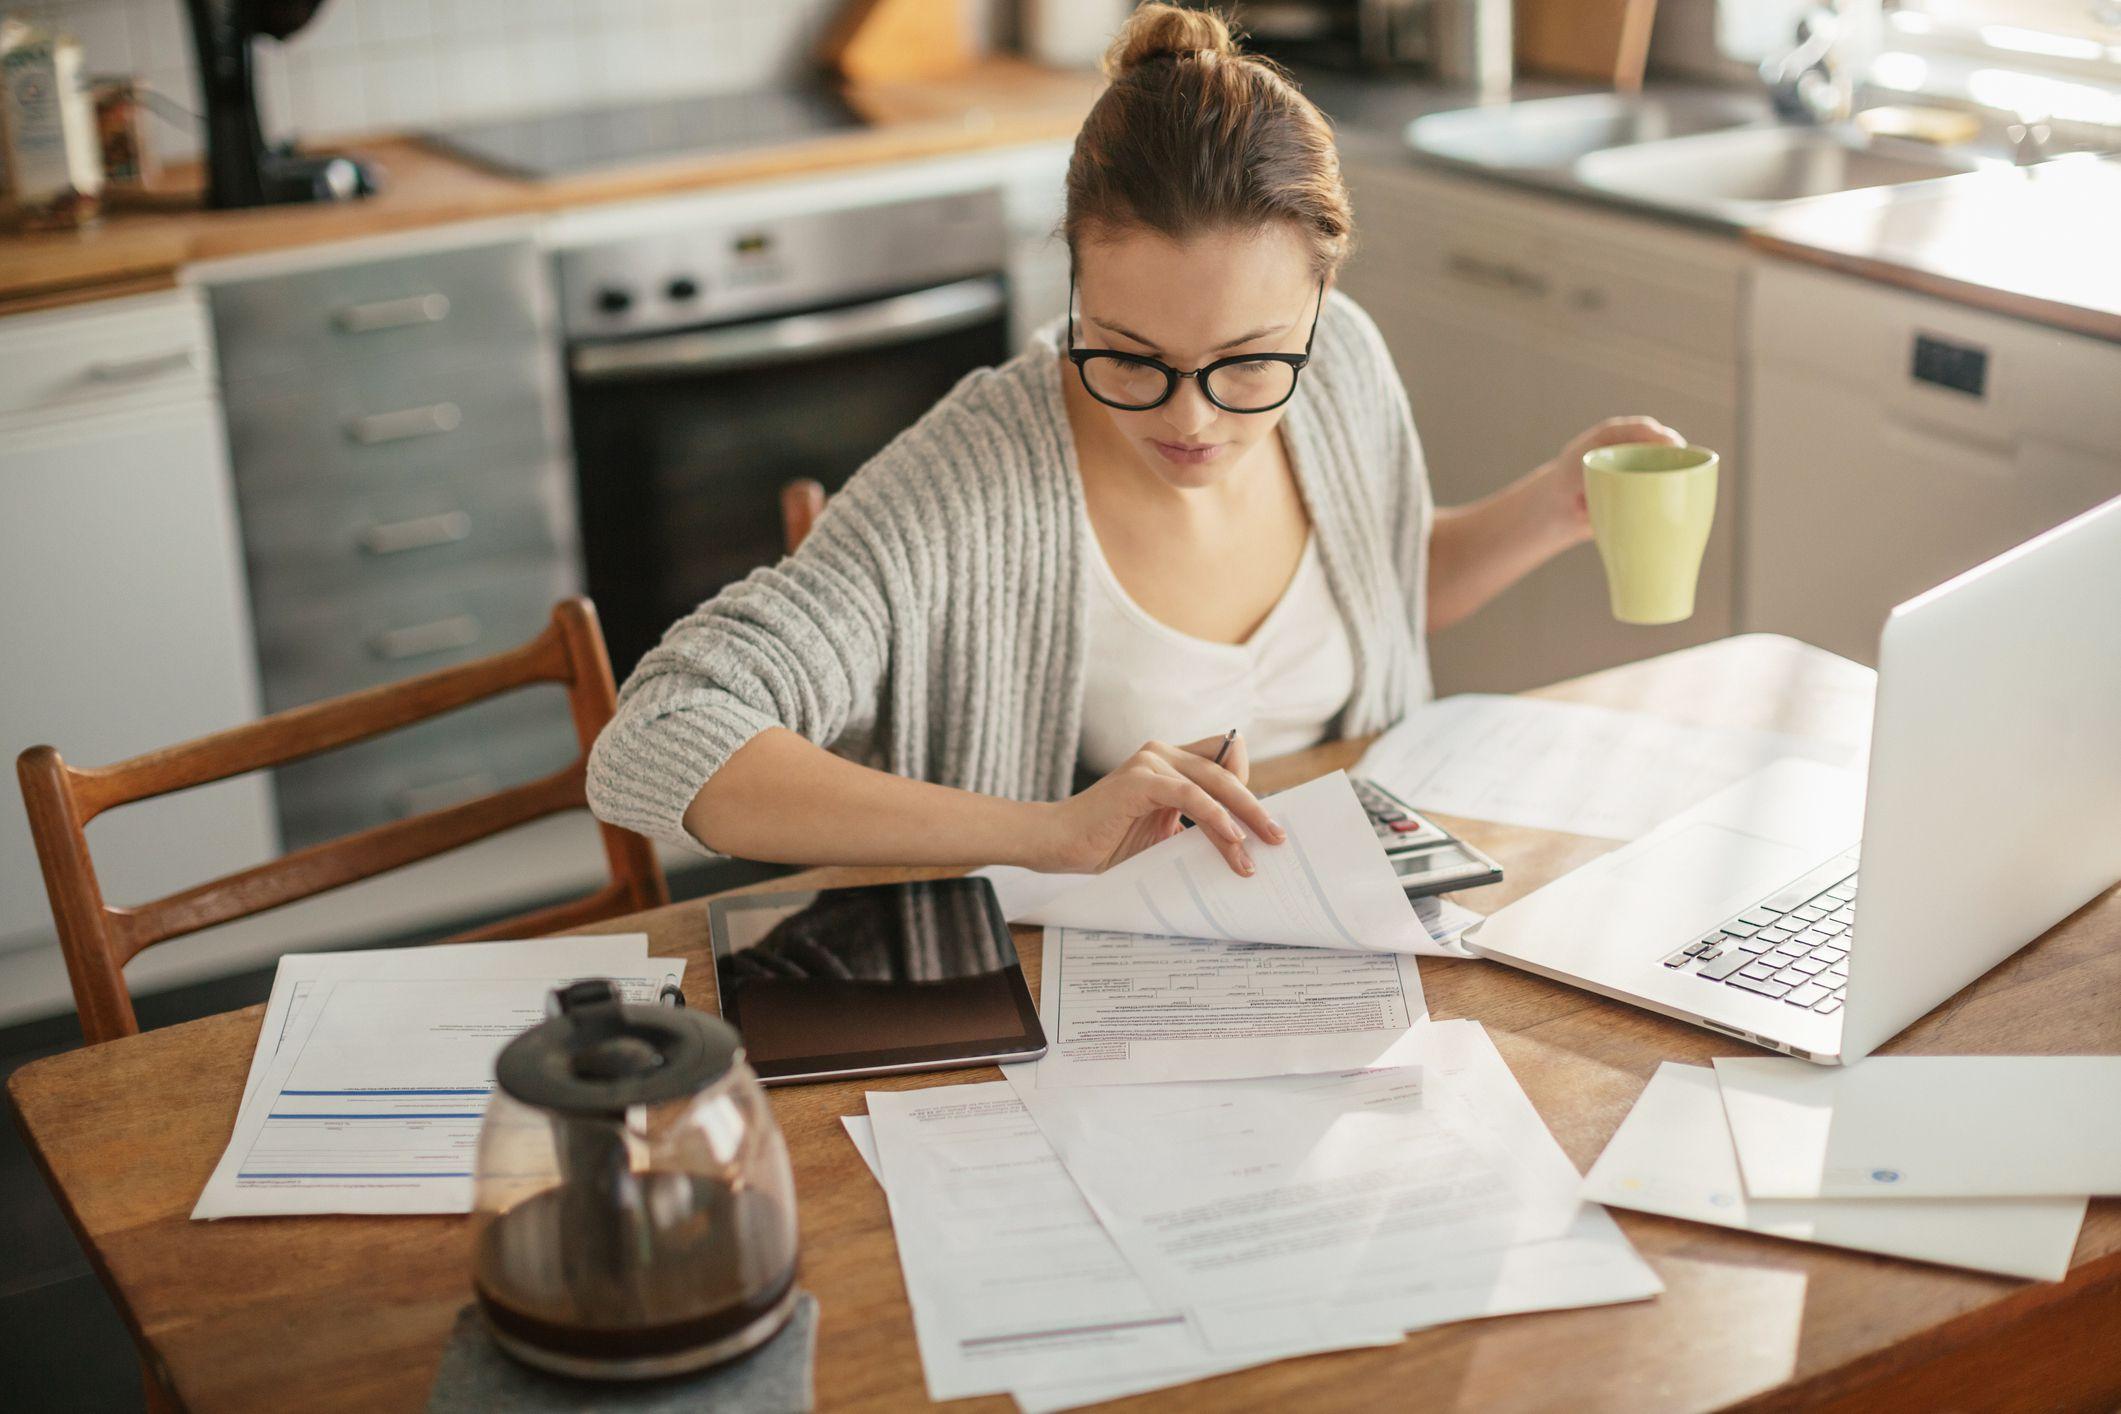 image-result-for-shocking-risks-self-employed